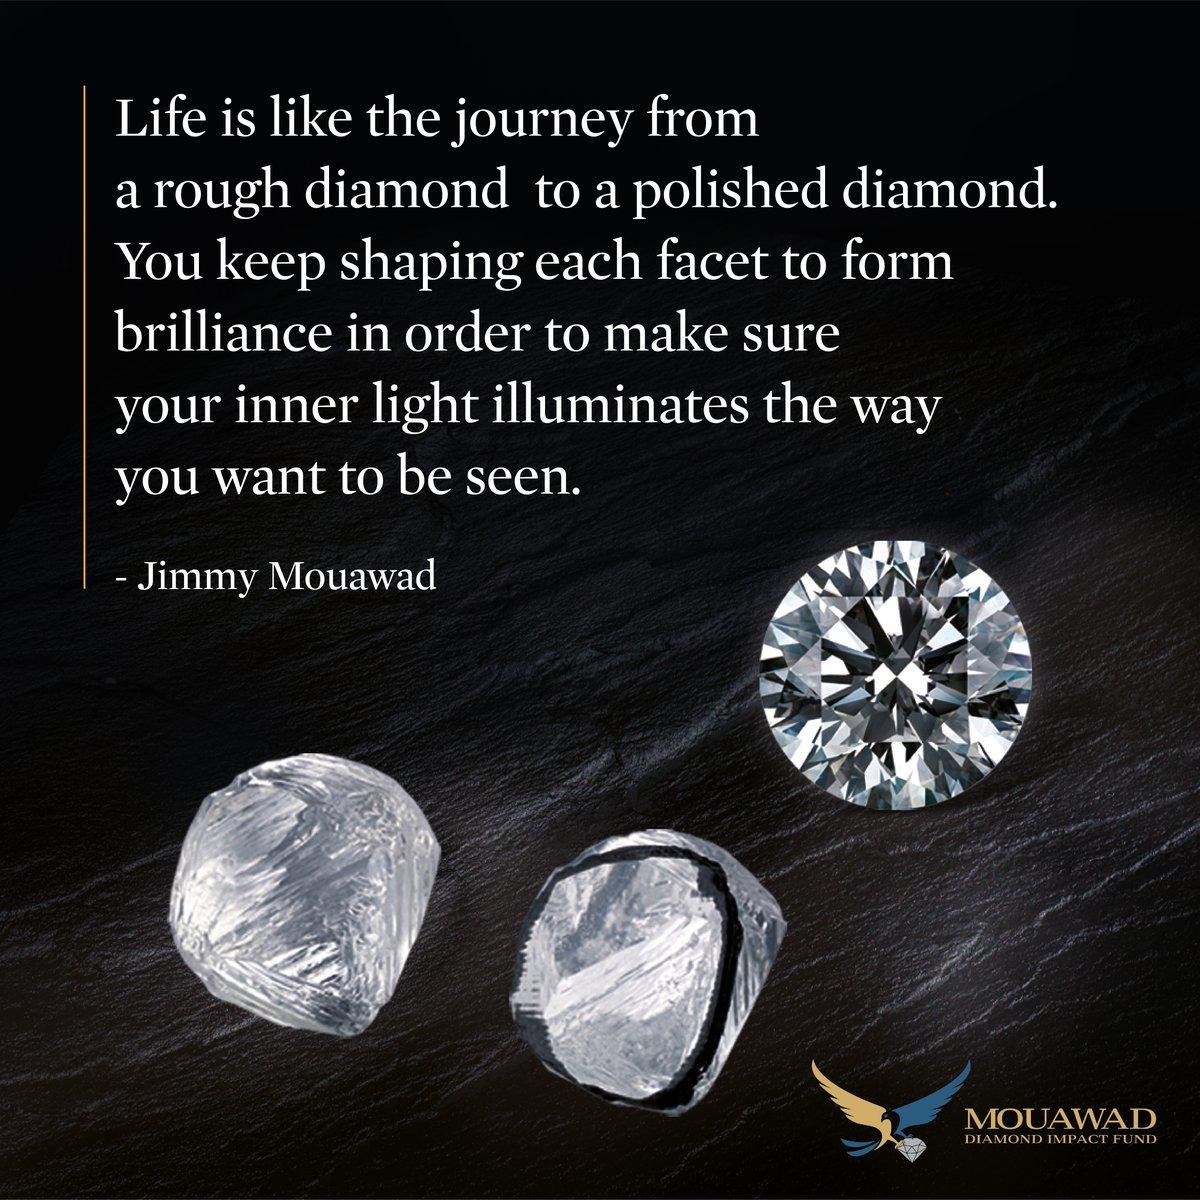 #Diamond #Heritage Lifequotes #Motivation #Mouawad #Inspiraton #Lifelessons #Empowerment #Sustainability  #Brightfutures https://mwd.social/bf871pic.twitter.com/XmIS08Qv3k